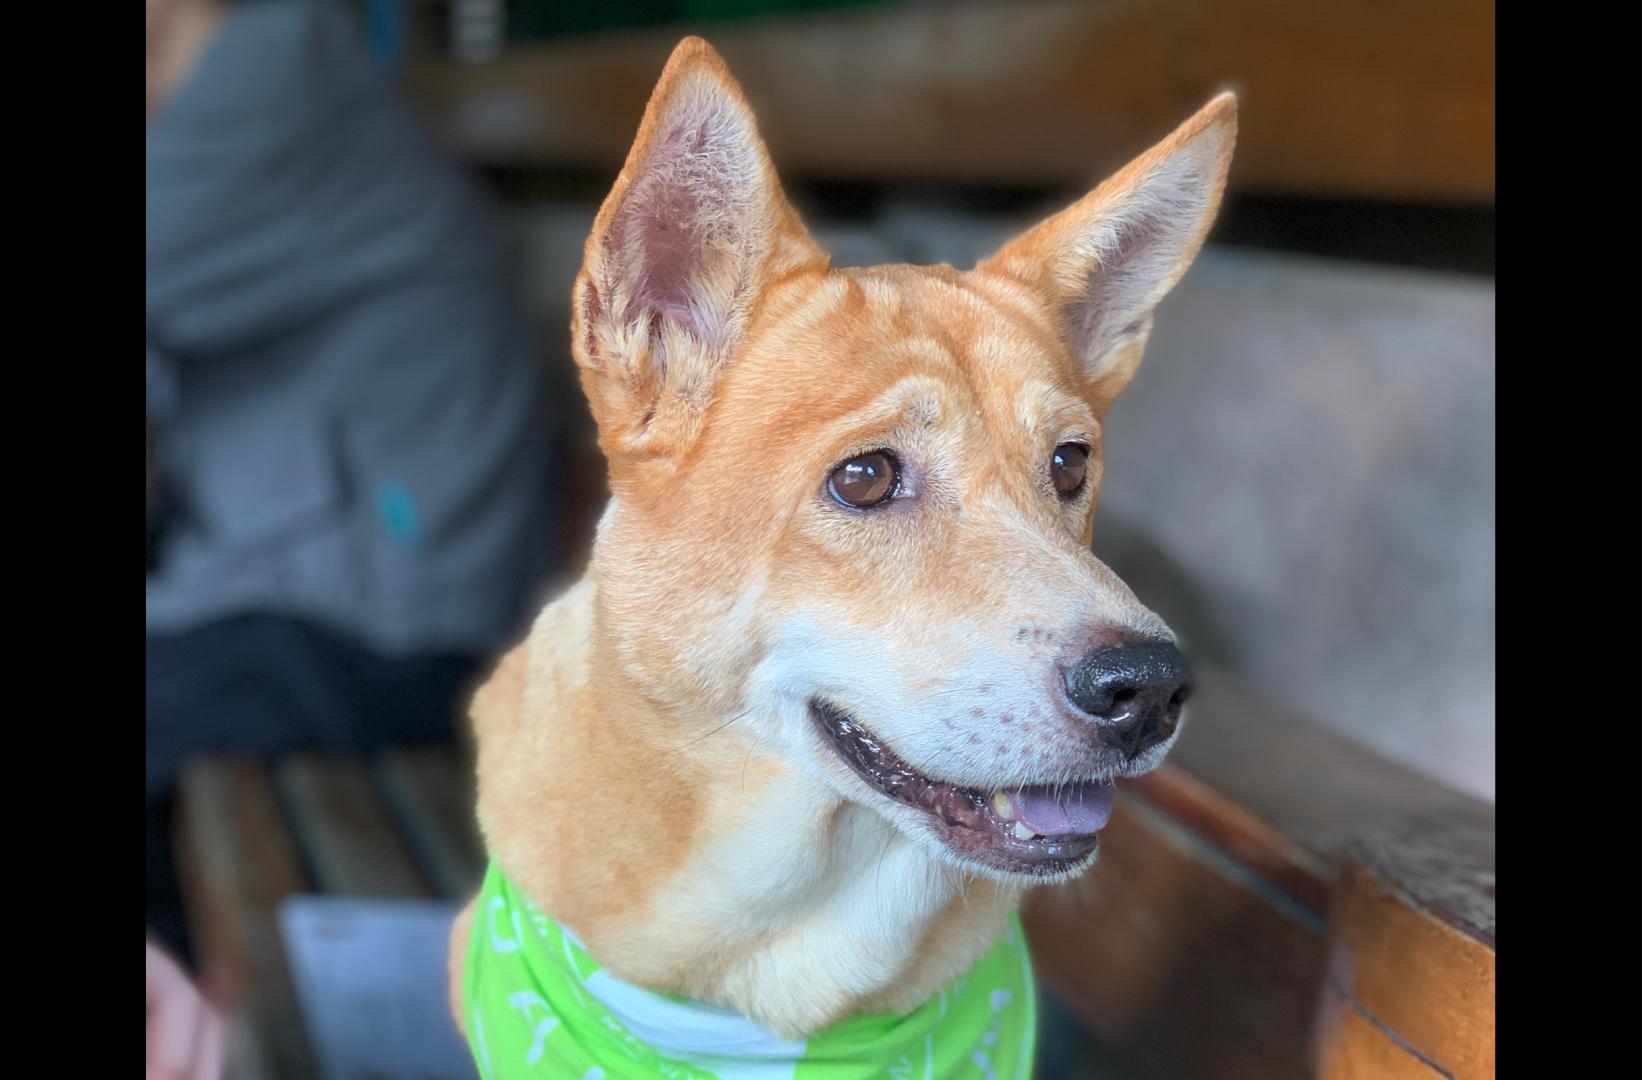 Quina, a dog for adoption at MASDAW / Macao pet adoptions